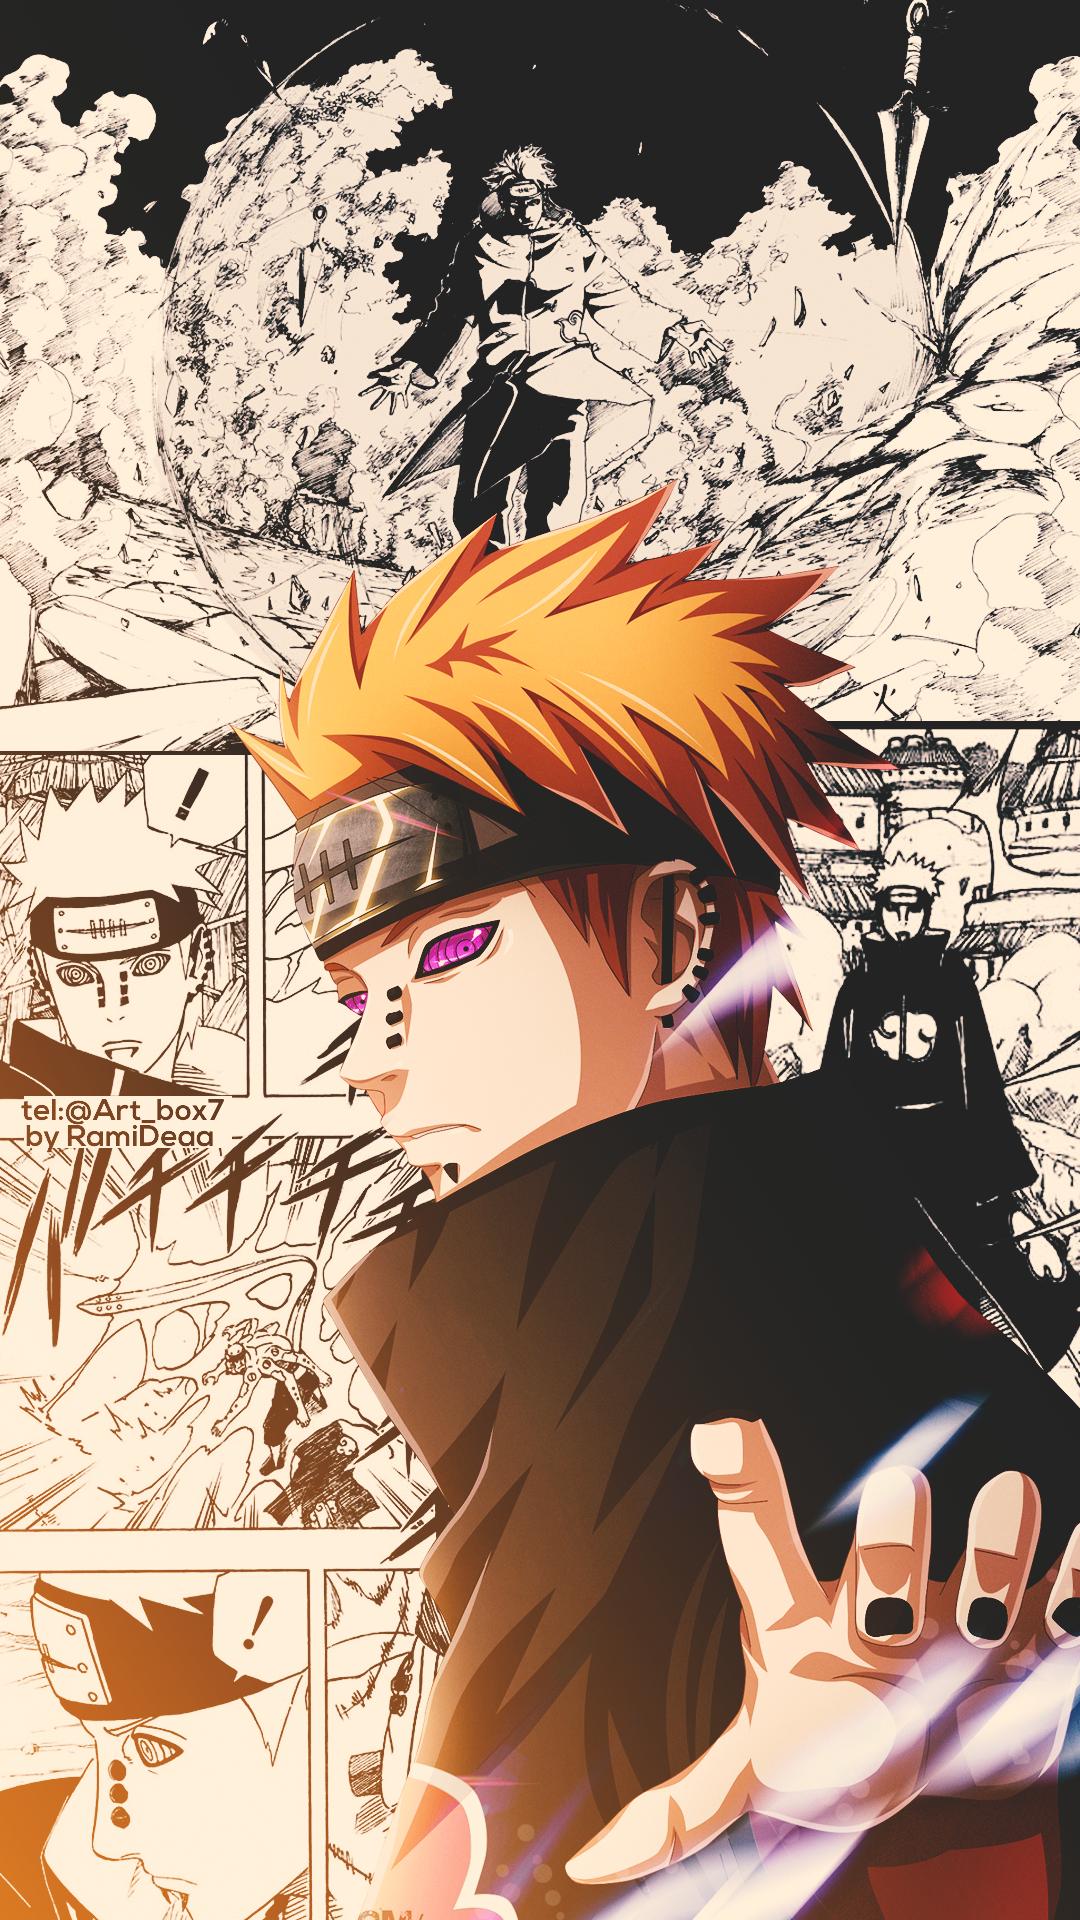 Pin By Caden Mitchell On Naruto Naruto Shippuden Anime Wallpaper Naruto Shippuden Anime Naruto